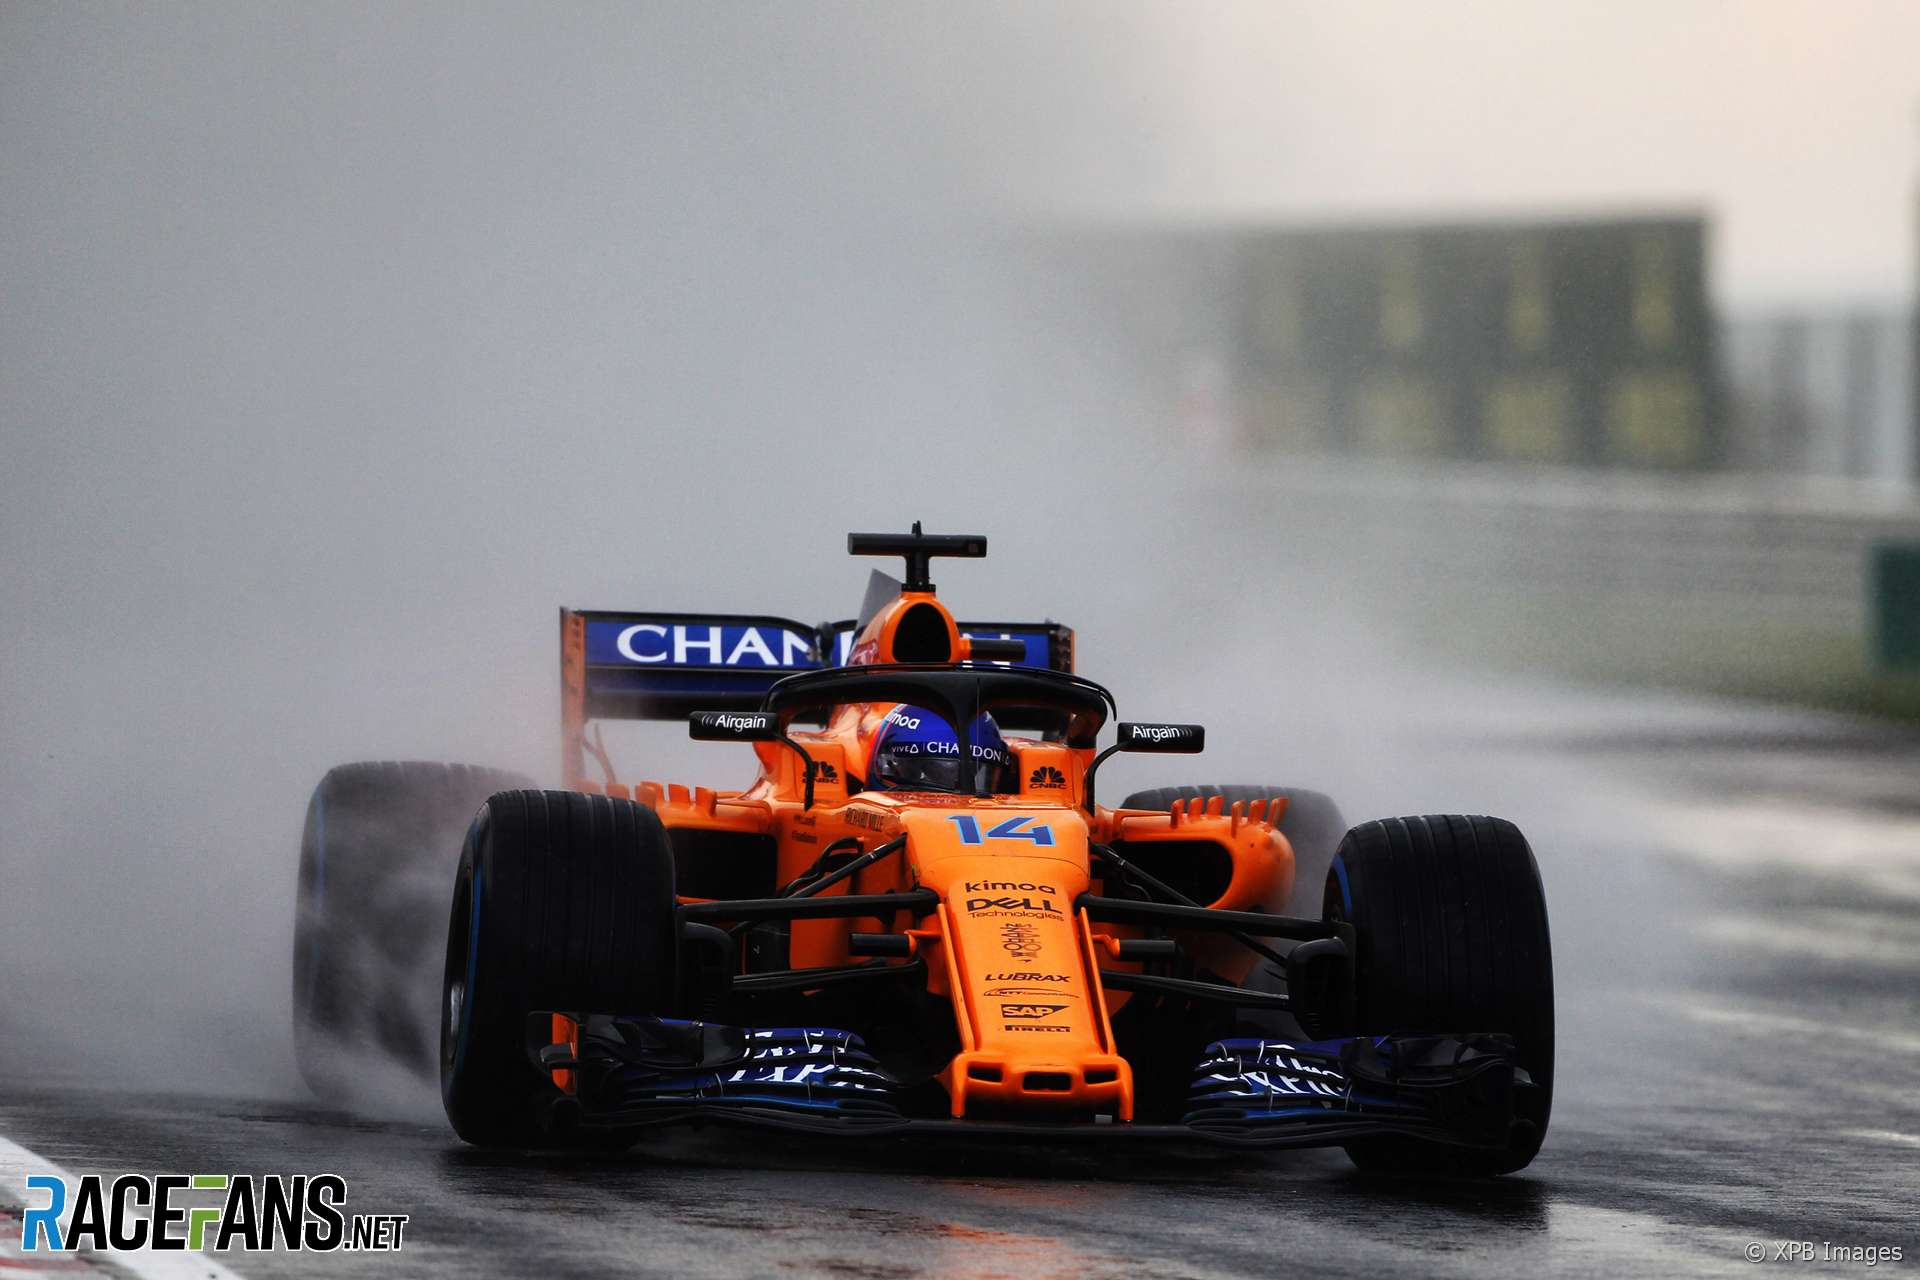 Fernando Alonso, McLaren, Hungaroring, 2018